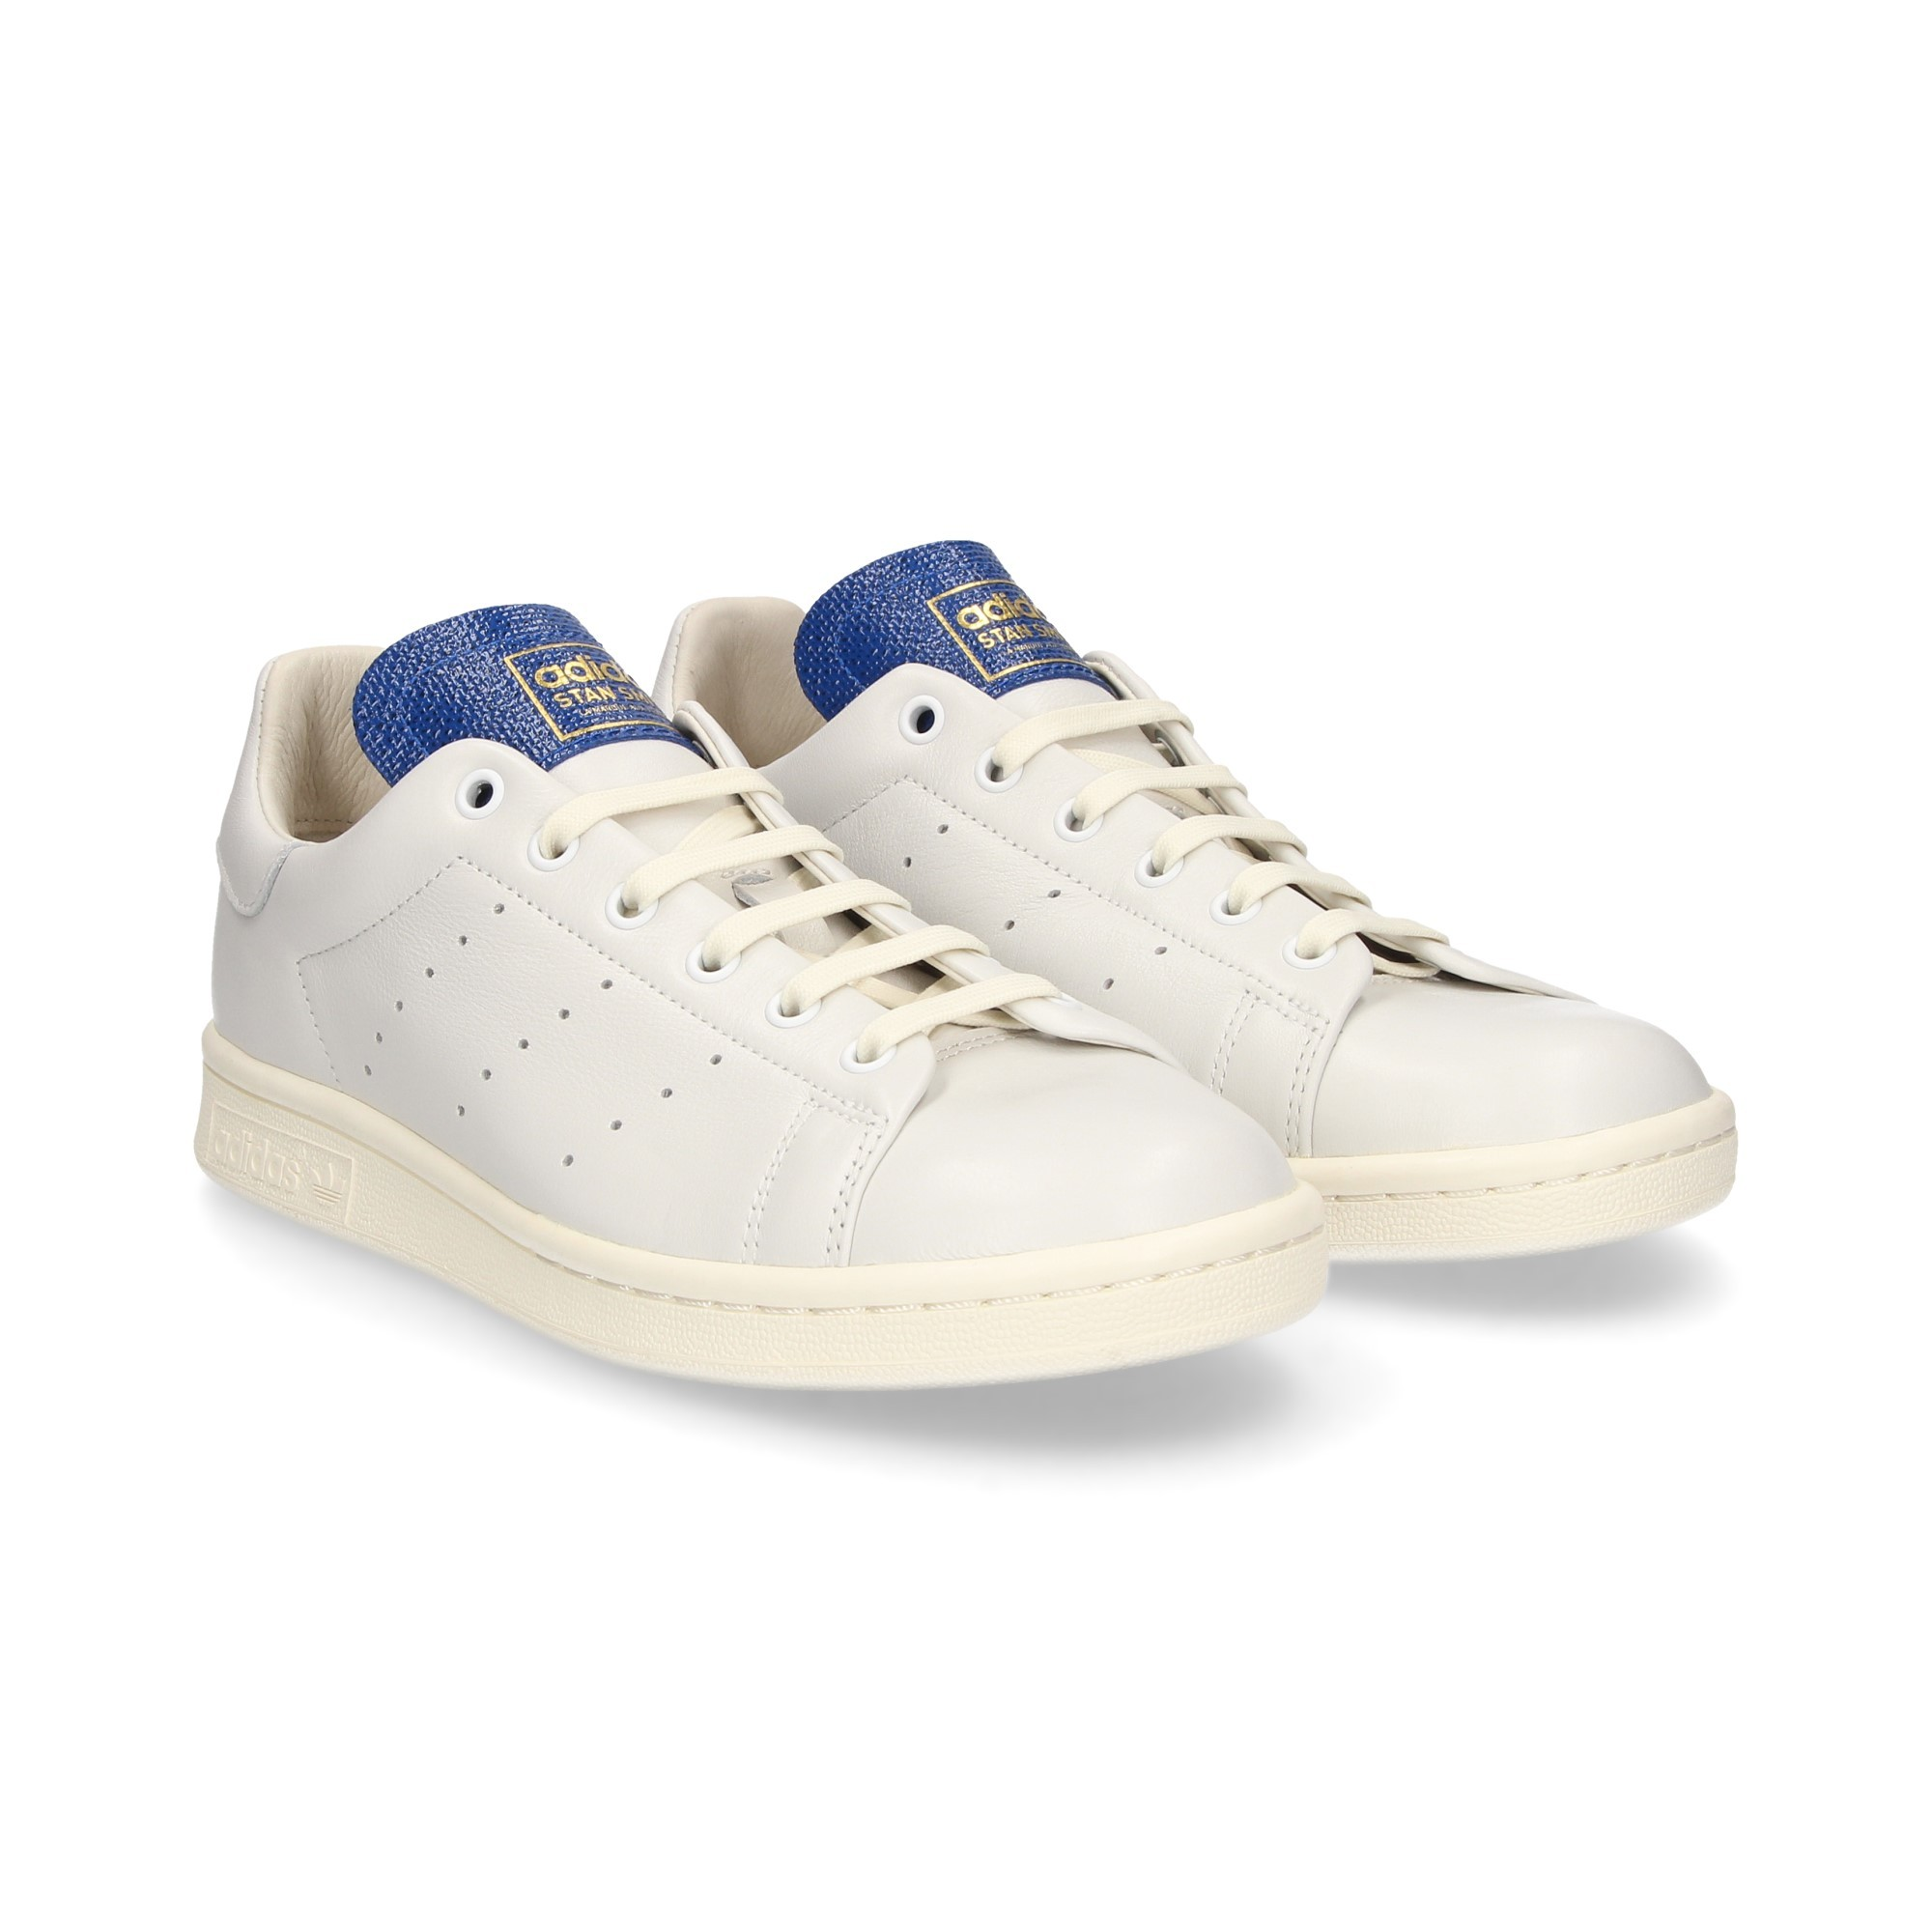 Smith Stan Blanco Mujer Adidas Zapatillas Bt De Ibgf7Yym6v